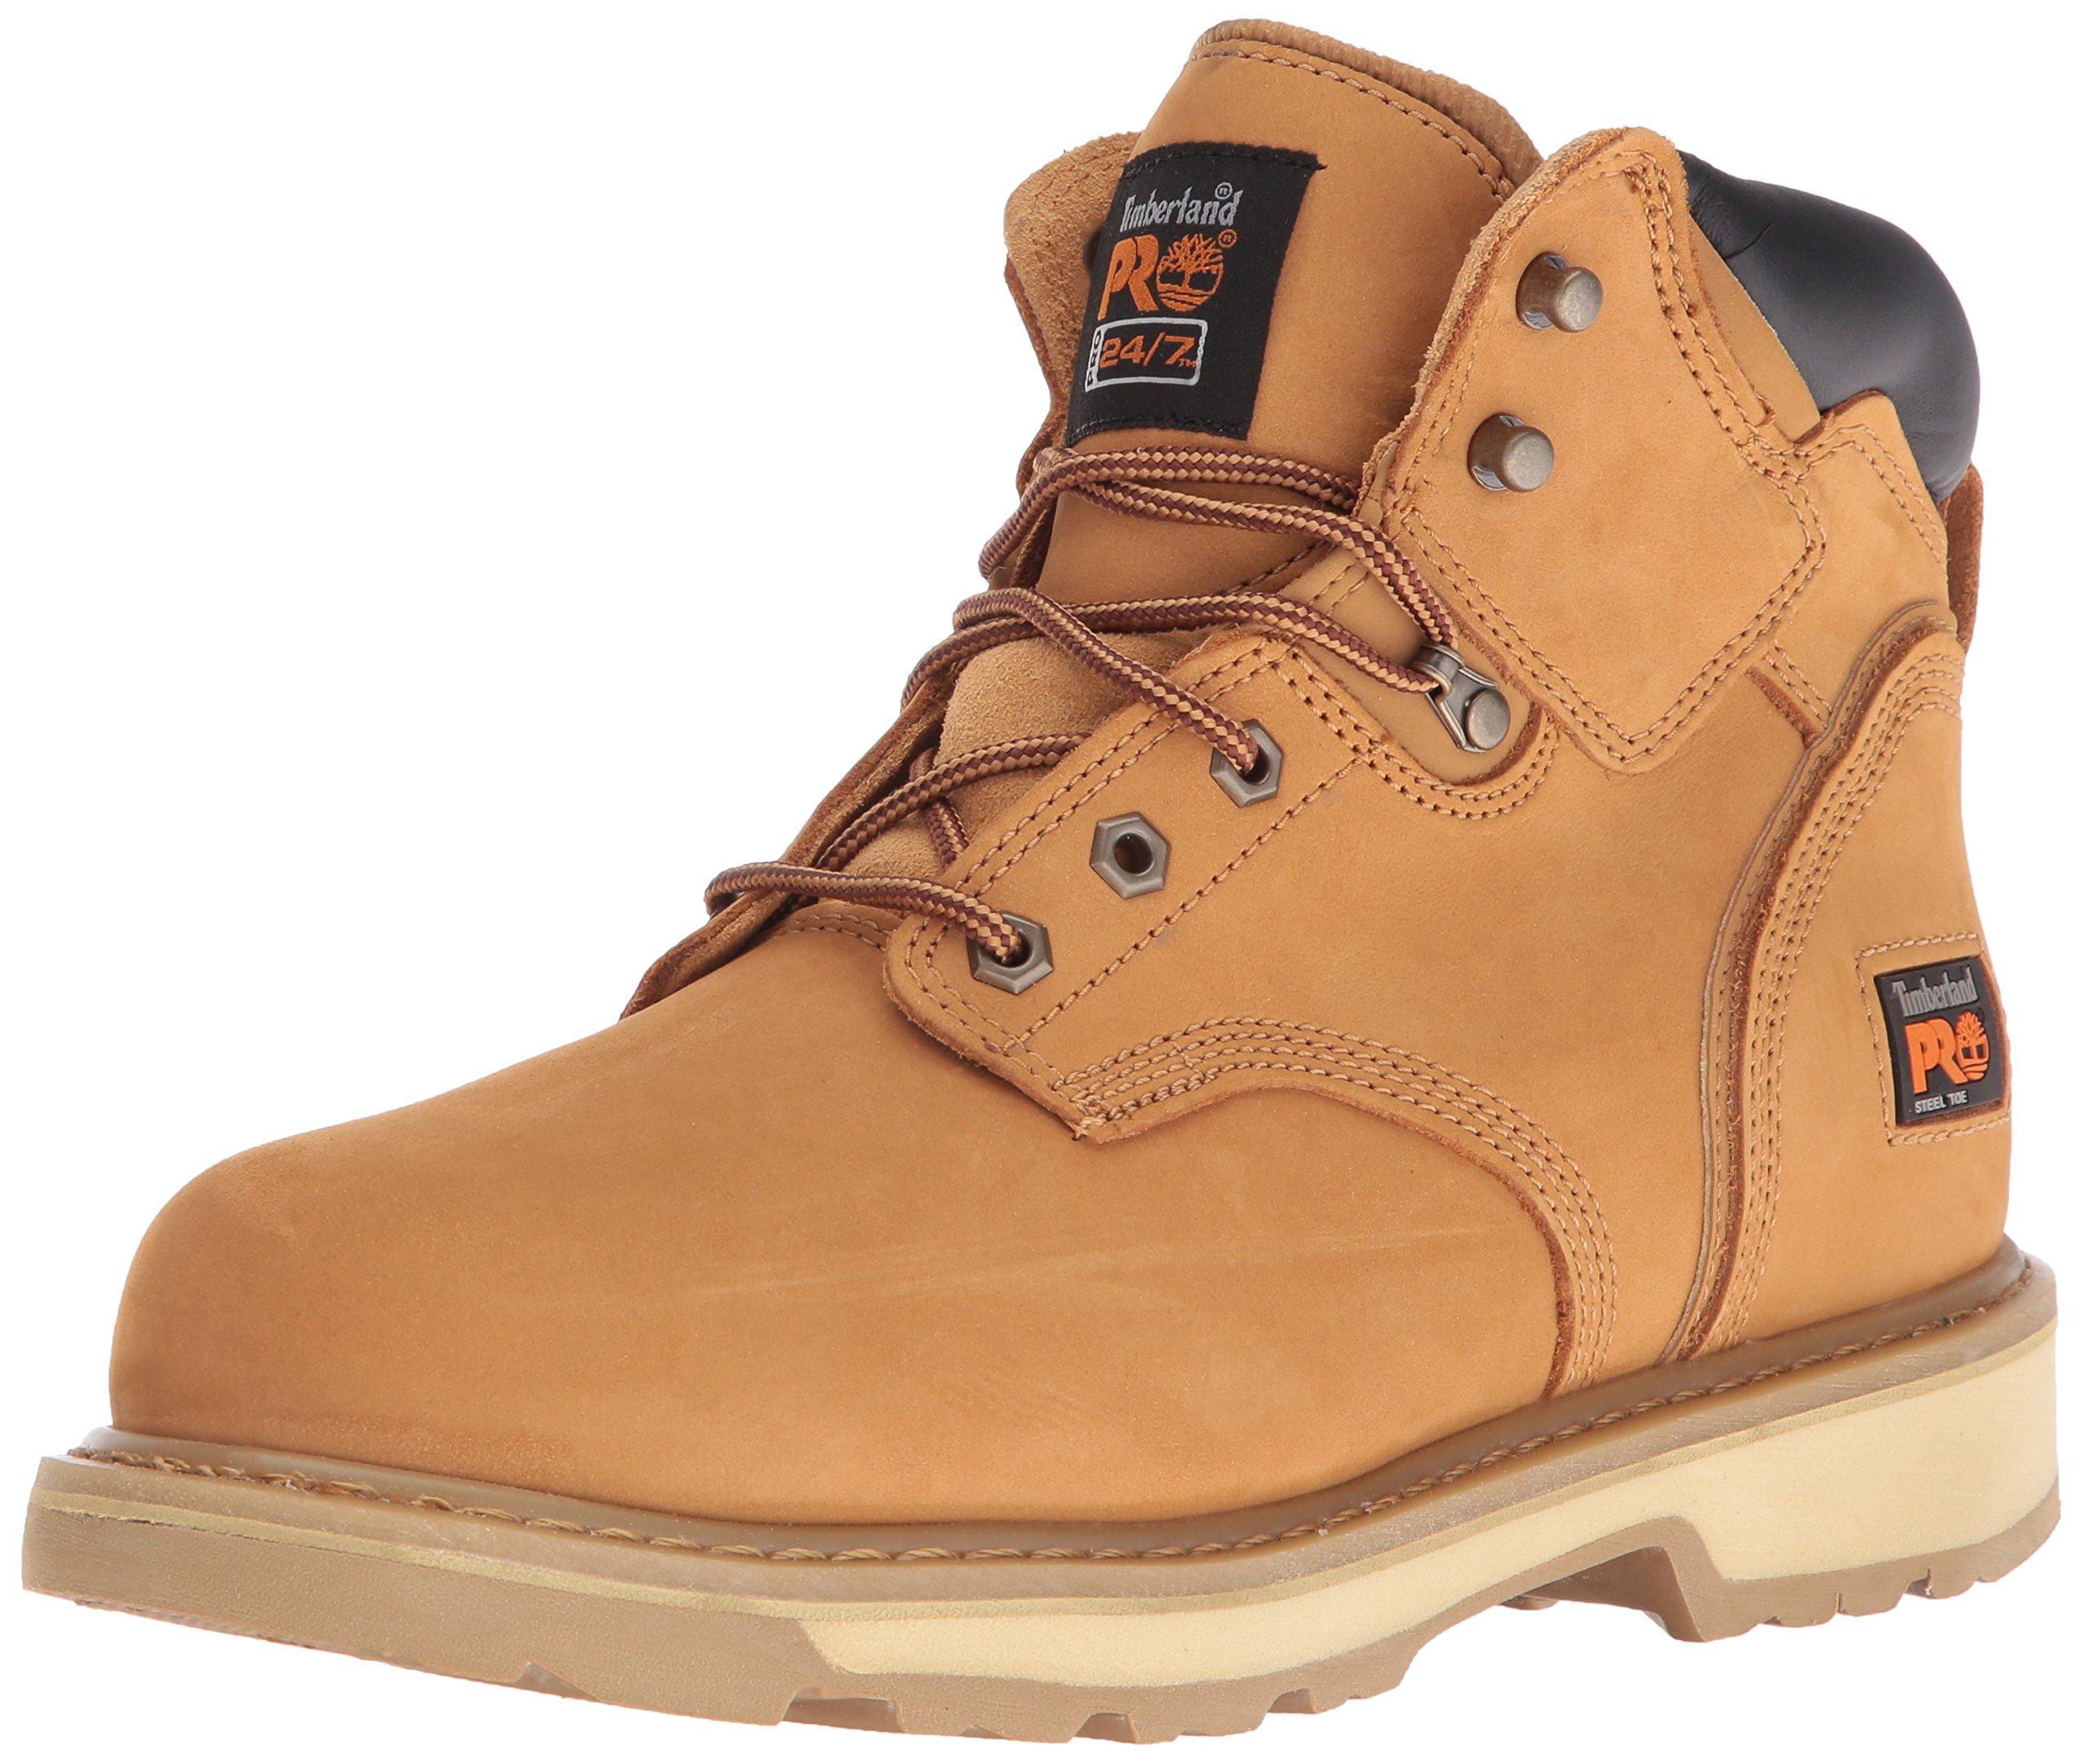 Timberland PRO Men's Pitboss 6'' Steel-Toe Boot, Wheat , 11.5 D - Medium